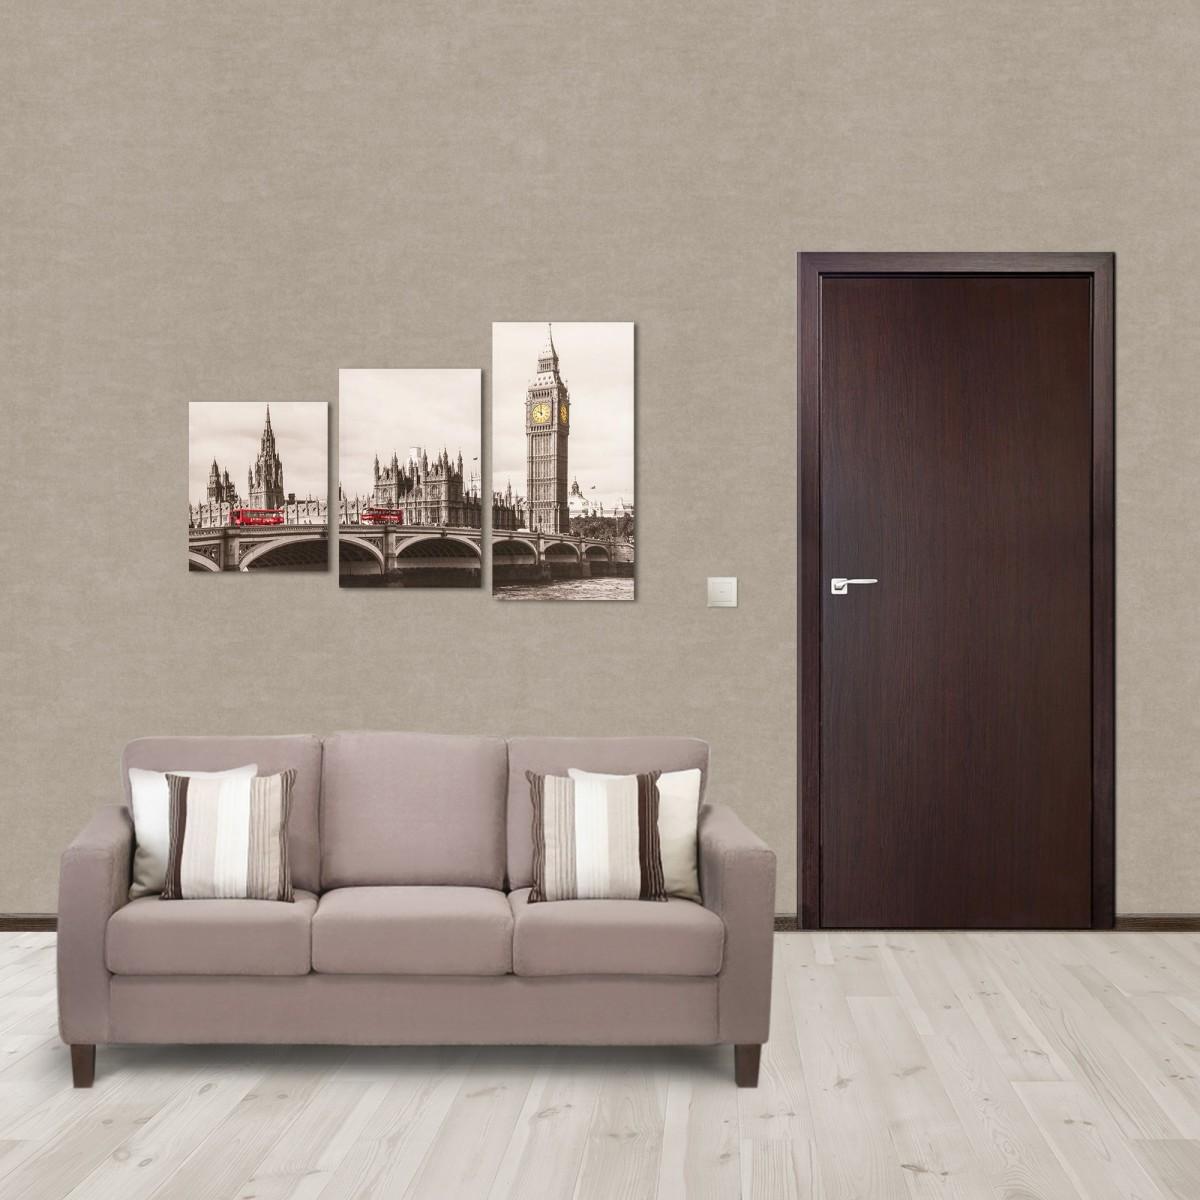 Дверь Межкомнатная Глухая Aura 70x200 Ламинация Цвет Венге 3d